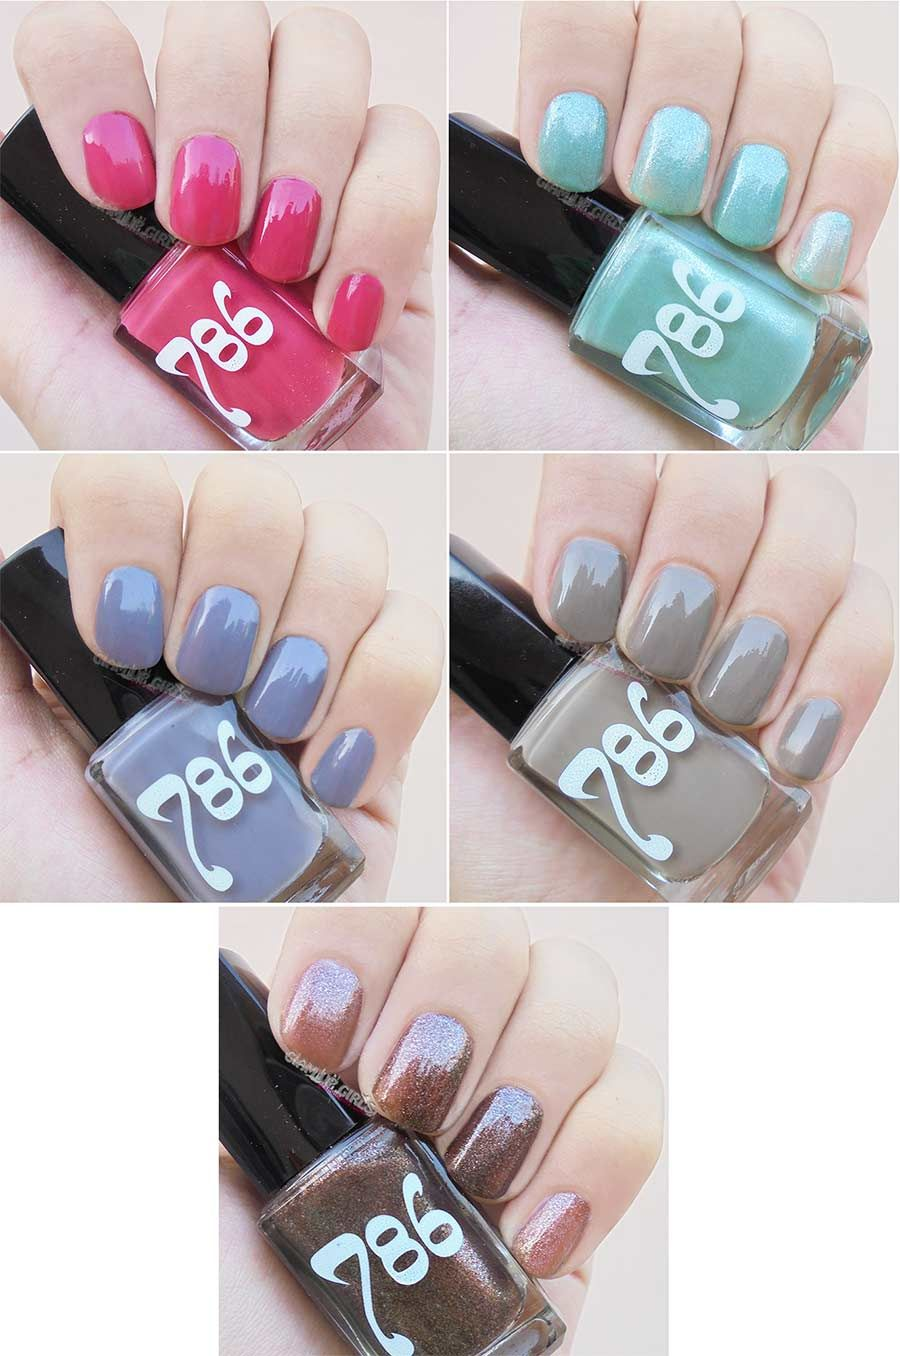 786 Cosmetics Halal Nail Enamel, Wudu friendly Nail Polish - Review ...